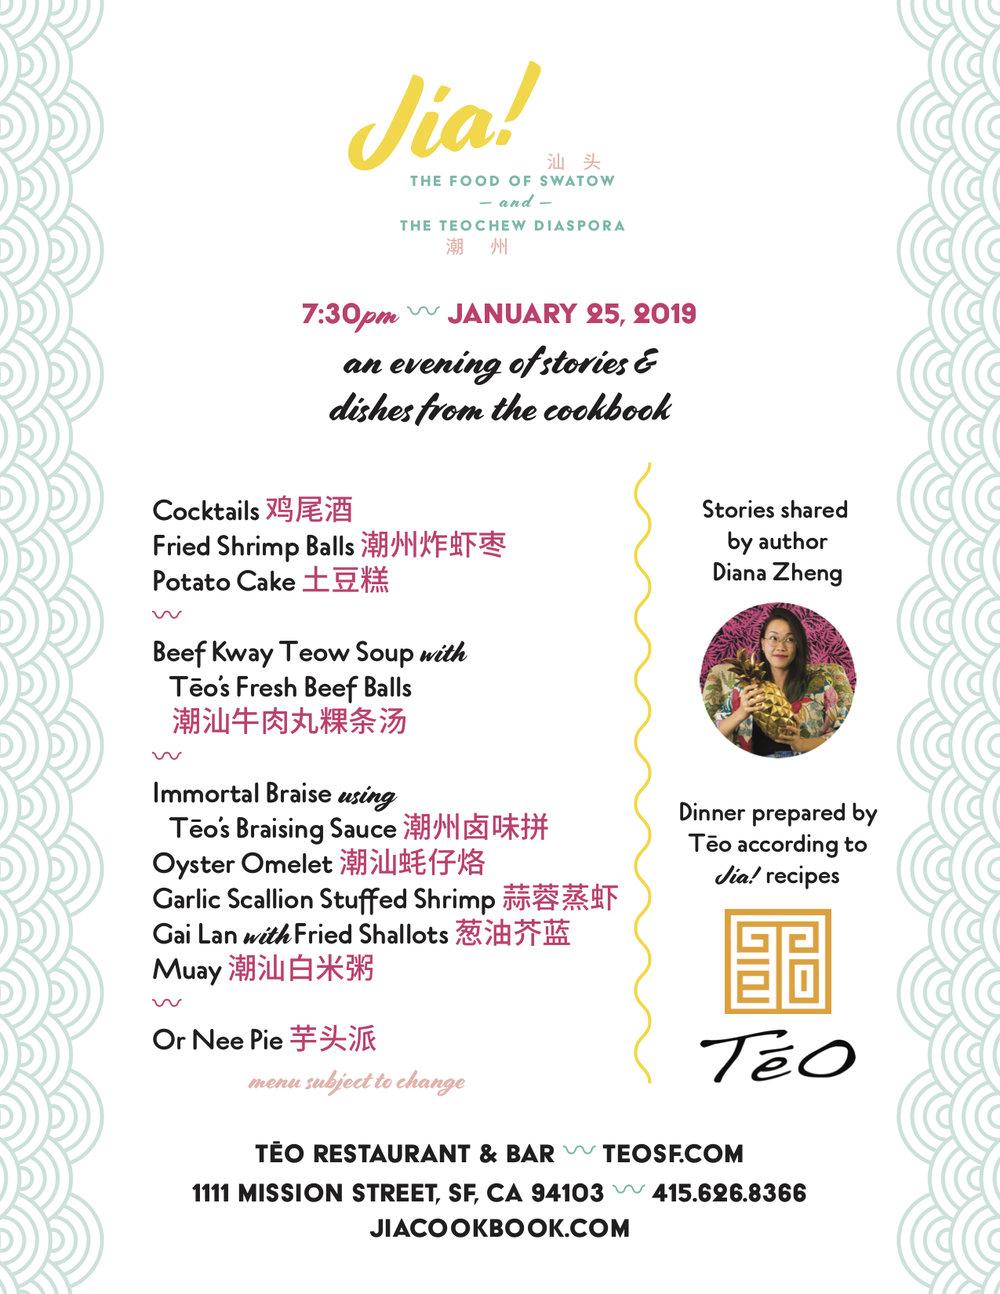 Jia x Teo dinner menu.jpg